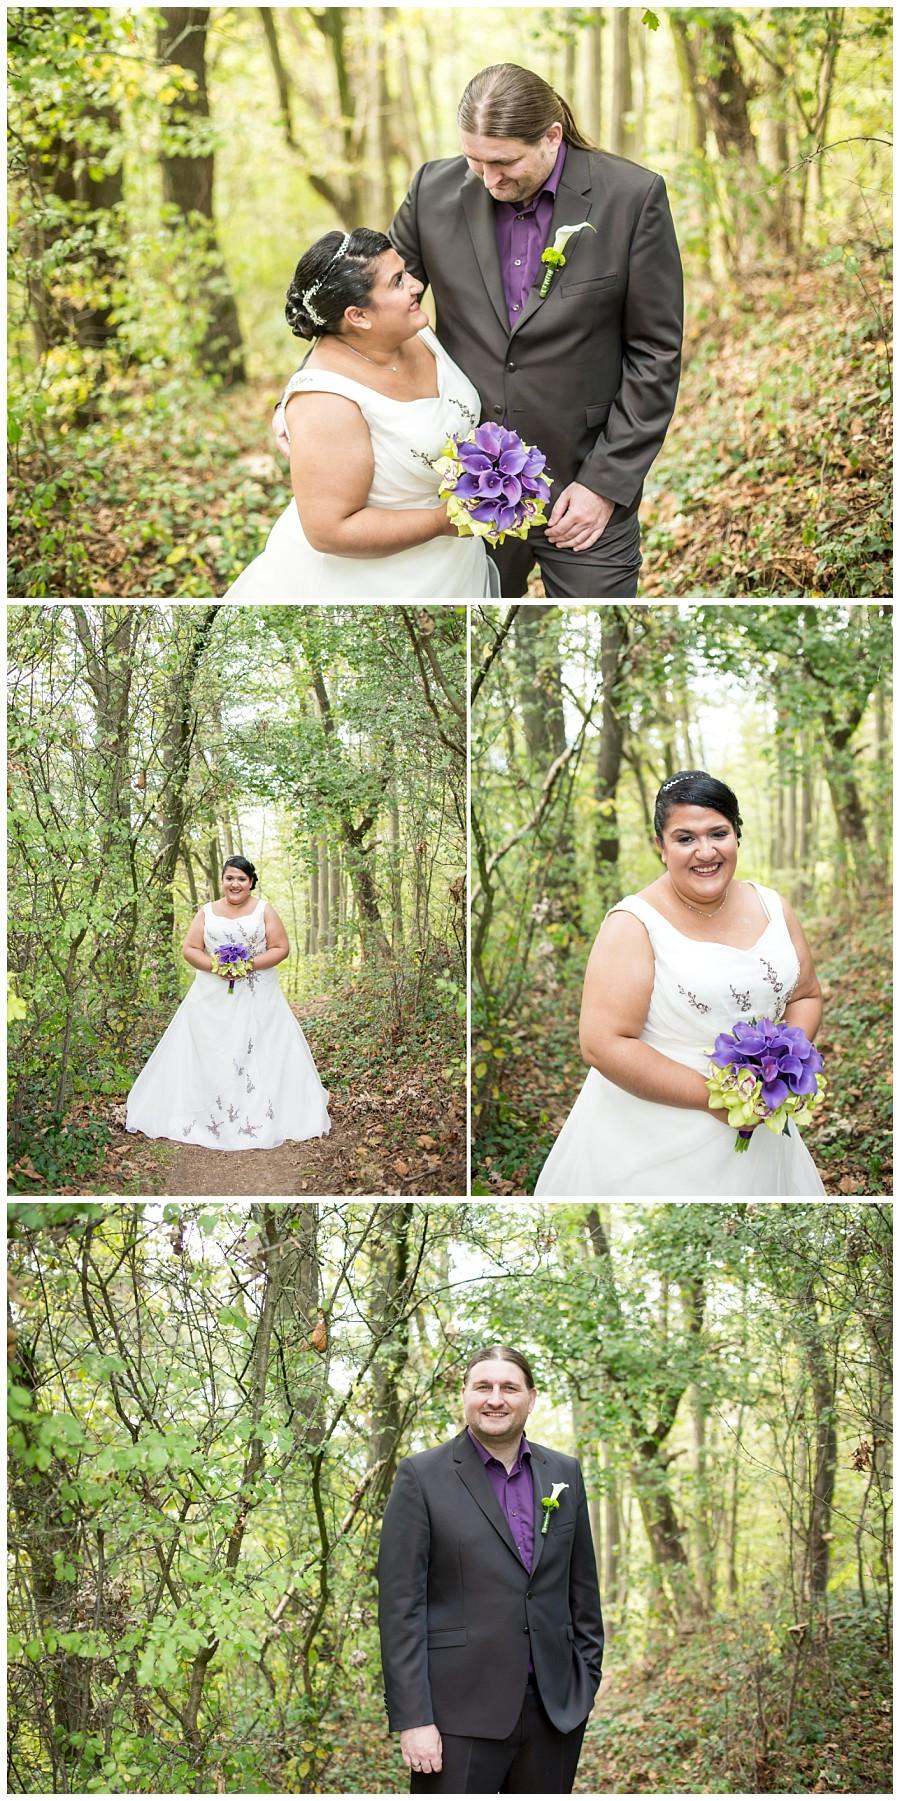 Hochzeit_Reitershof_Wirsberg_Claudia-Pelny-Fotografie_39